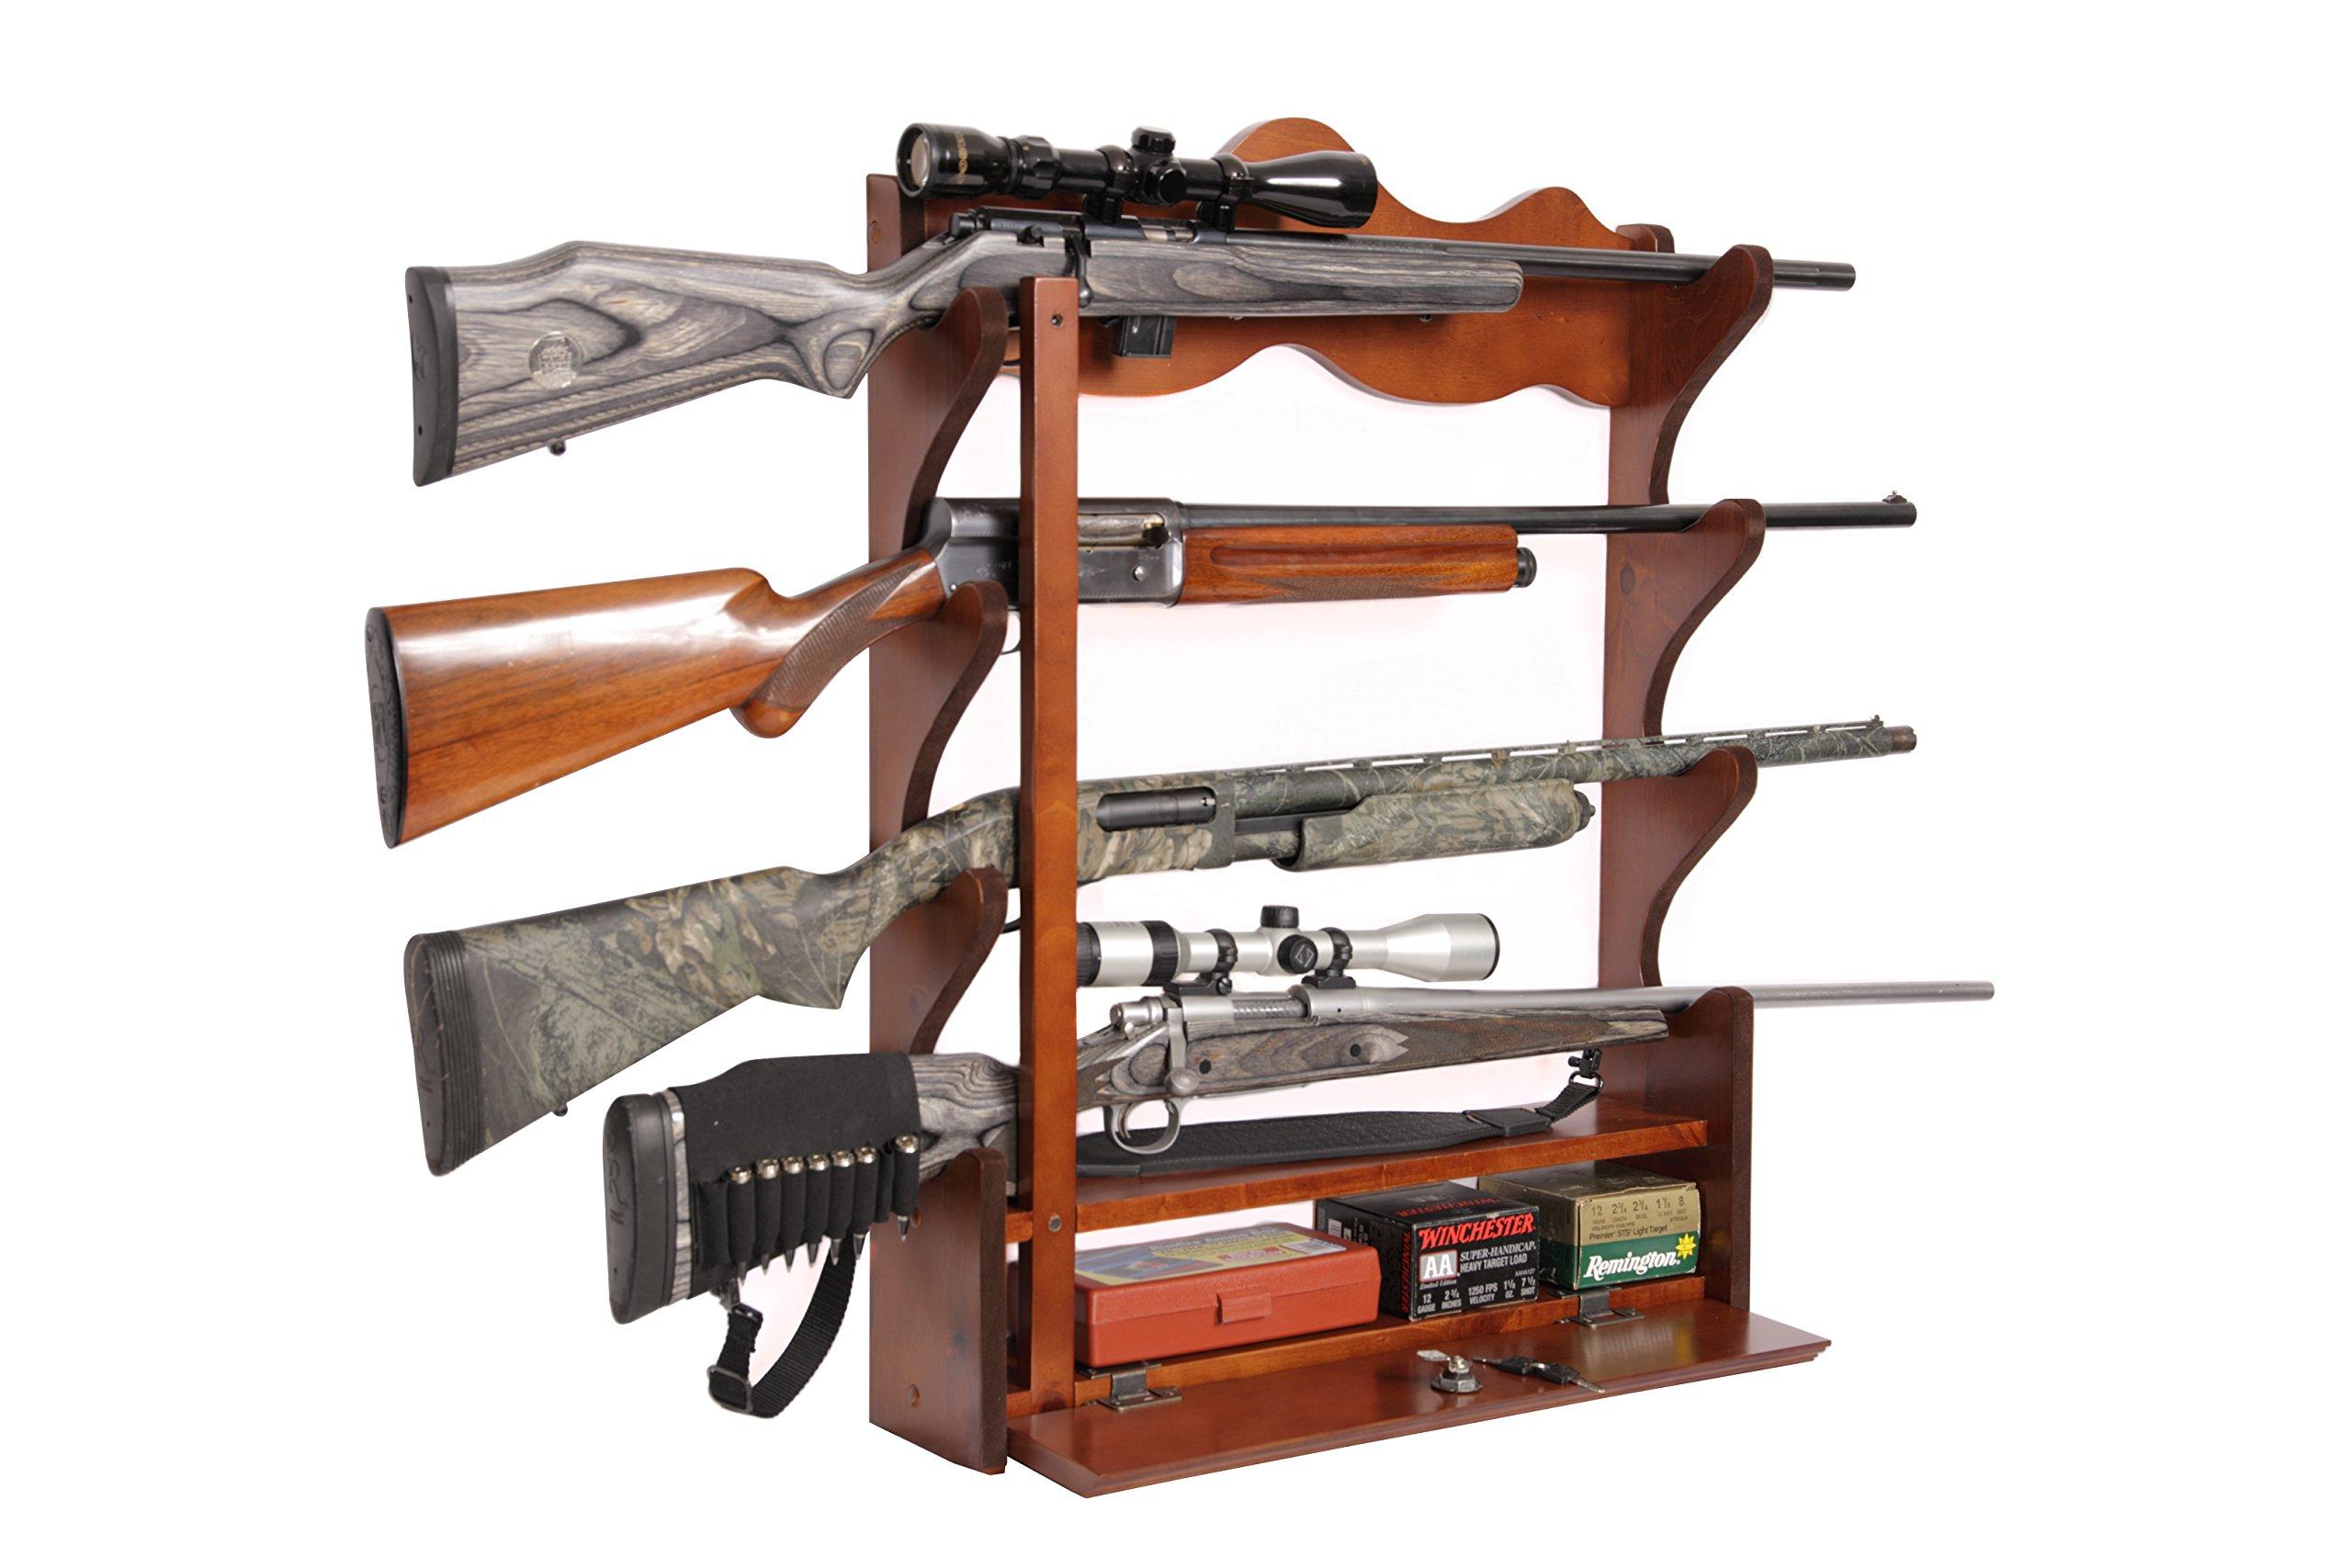 American Furniture Classics 840 4 Gun Wall Rack, Medium Brown by American Furniture Classics